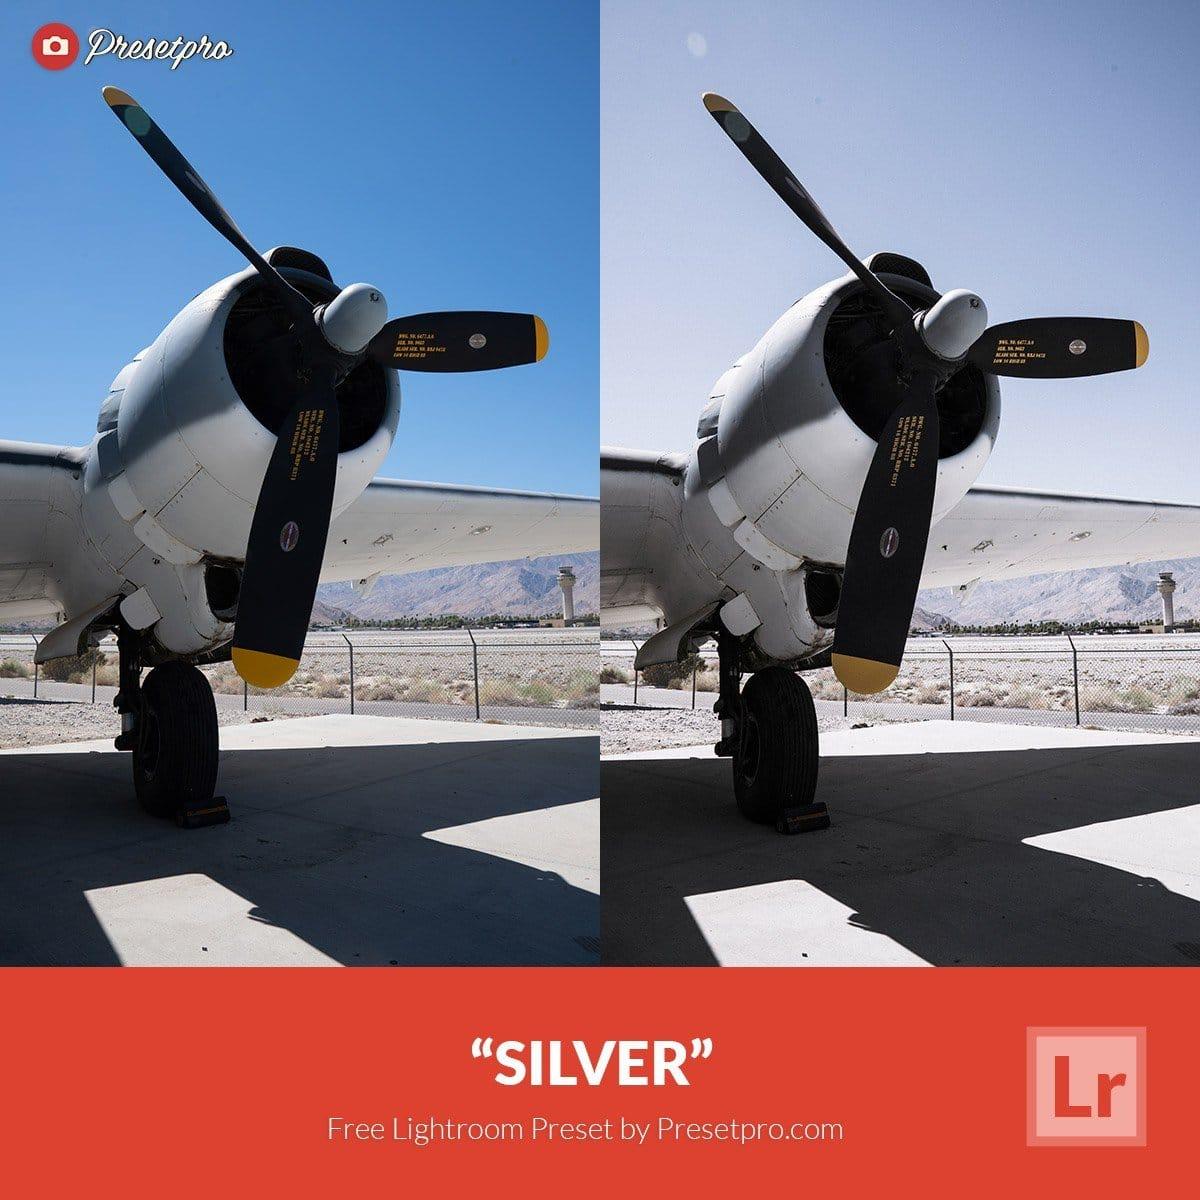 Free-Lightroom-Preset-Silver-Presetpro.com